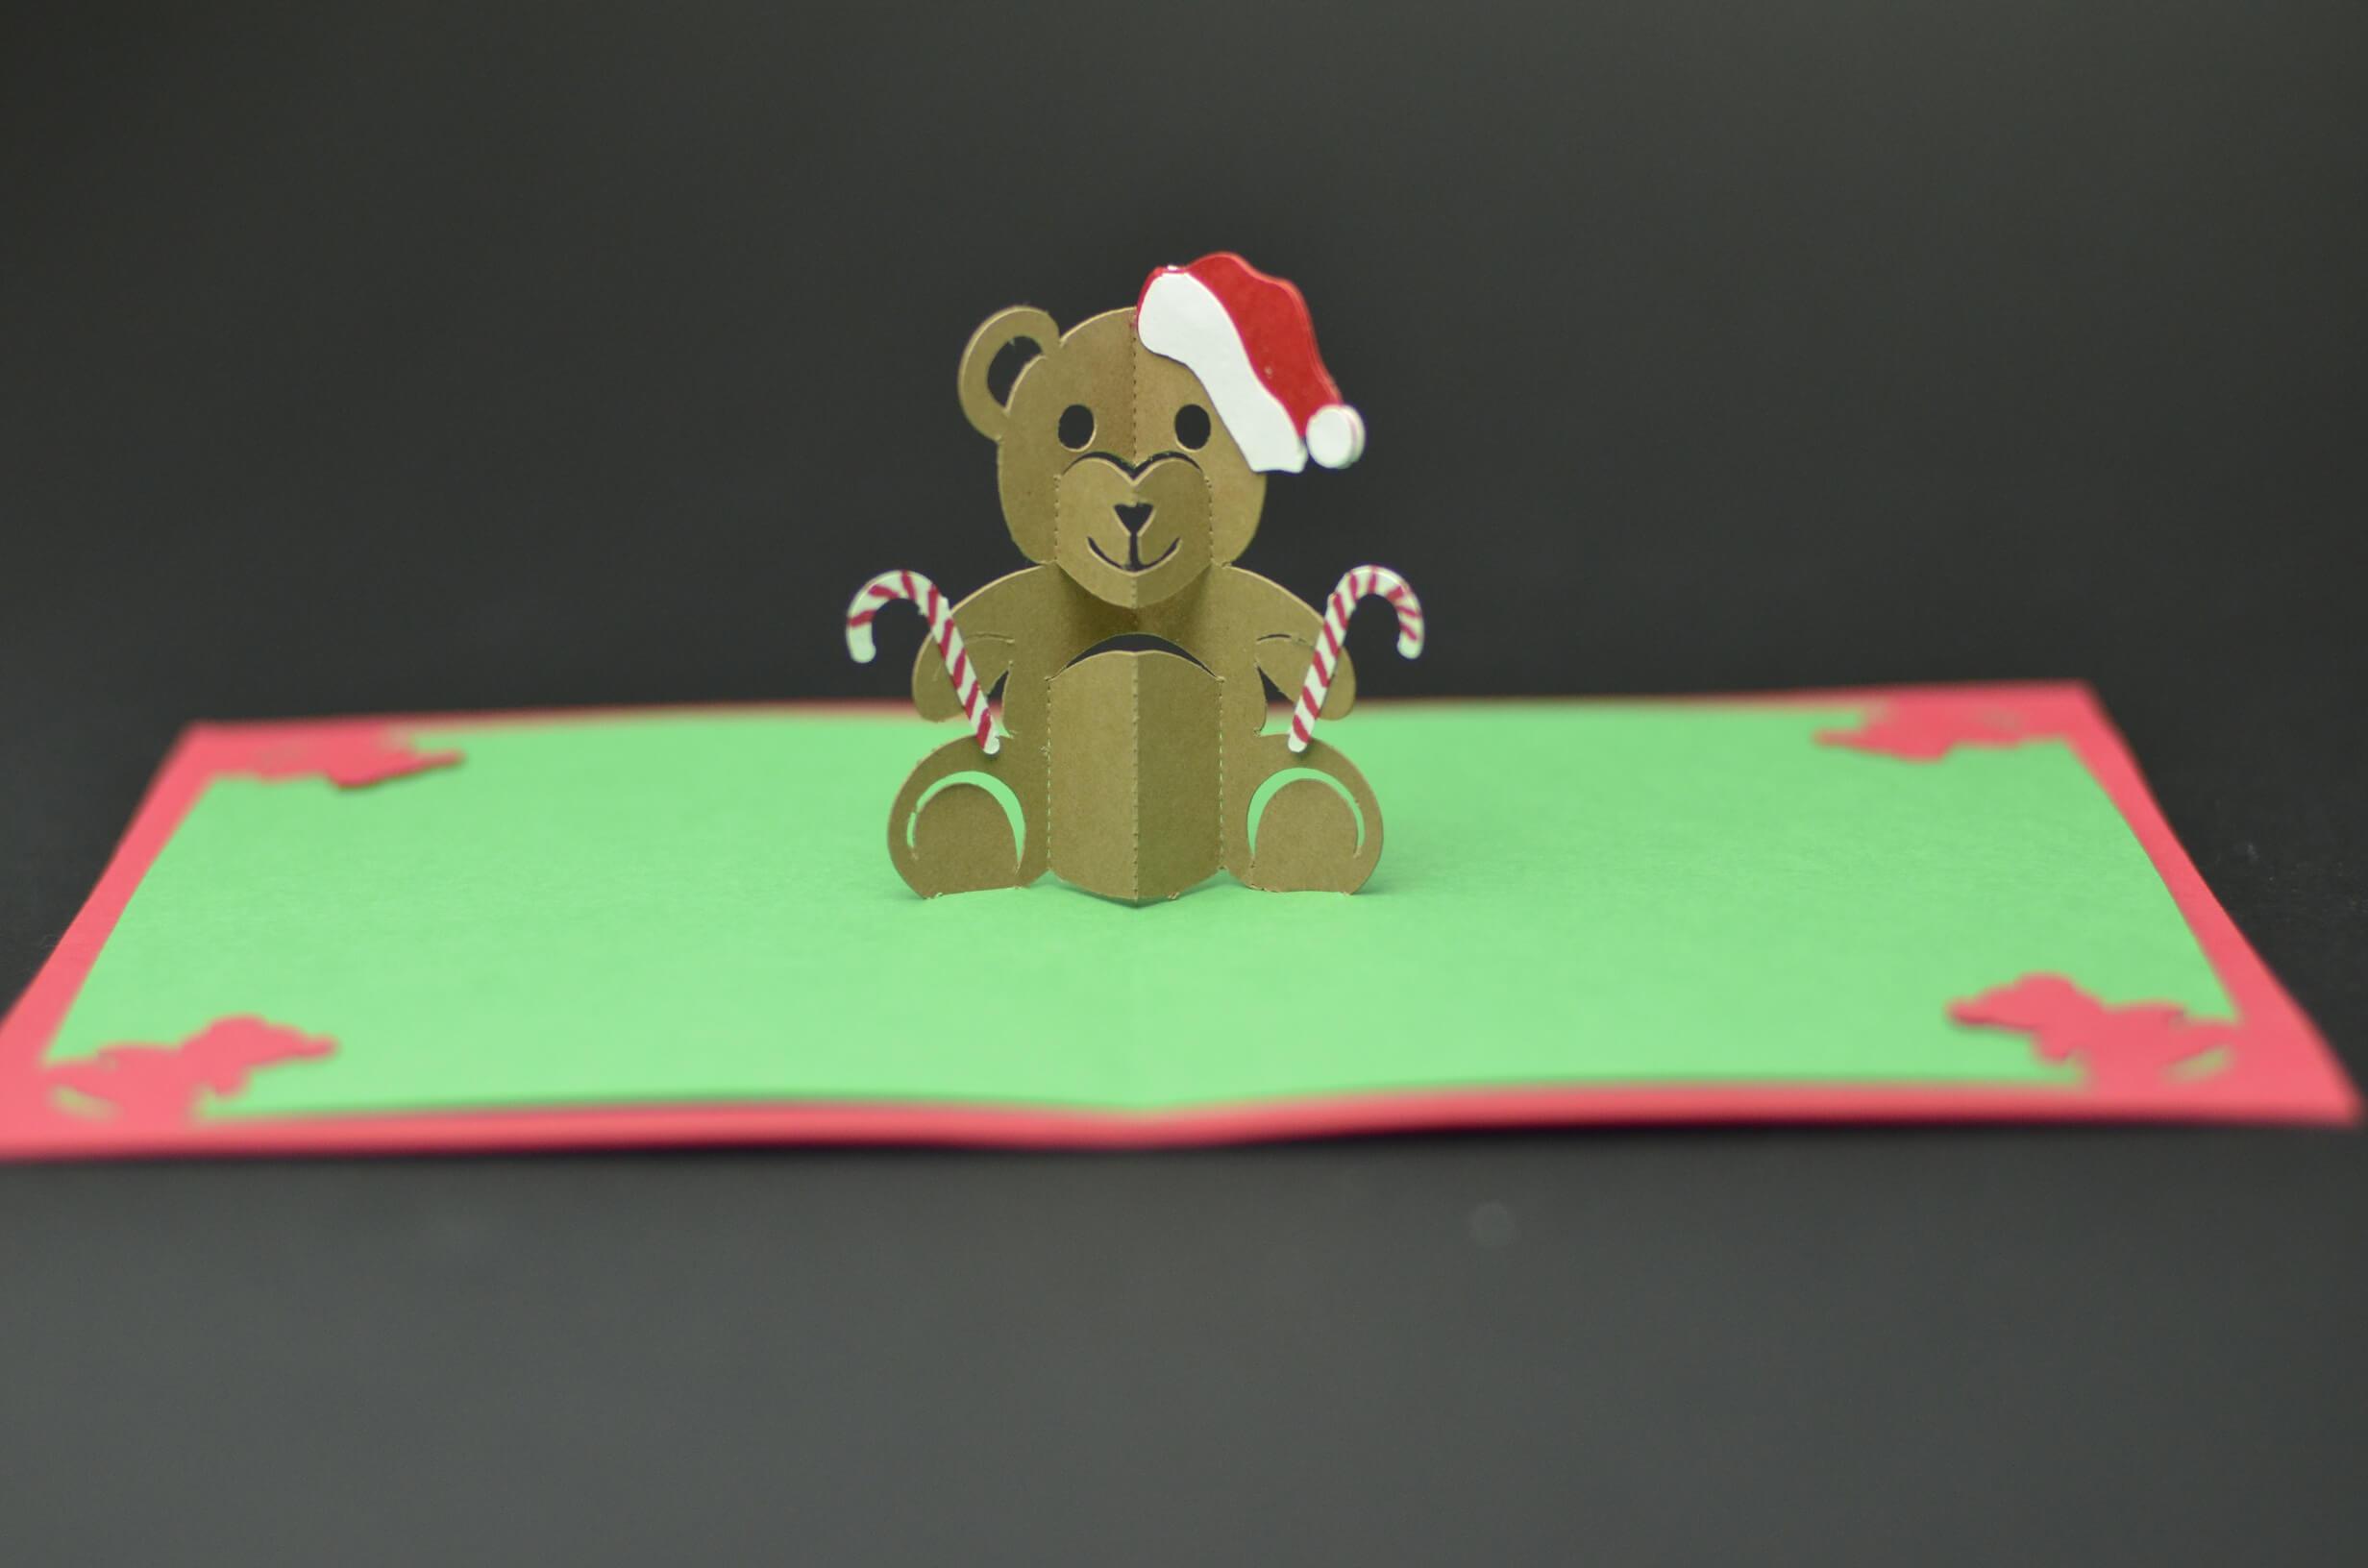 Teddy Bear Pop Up Card: Tutorial And Template - Creative Pop in Teddy Bear Pop Up Card Template Free